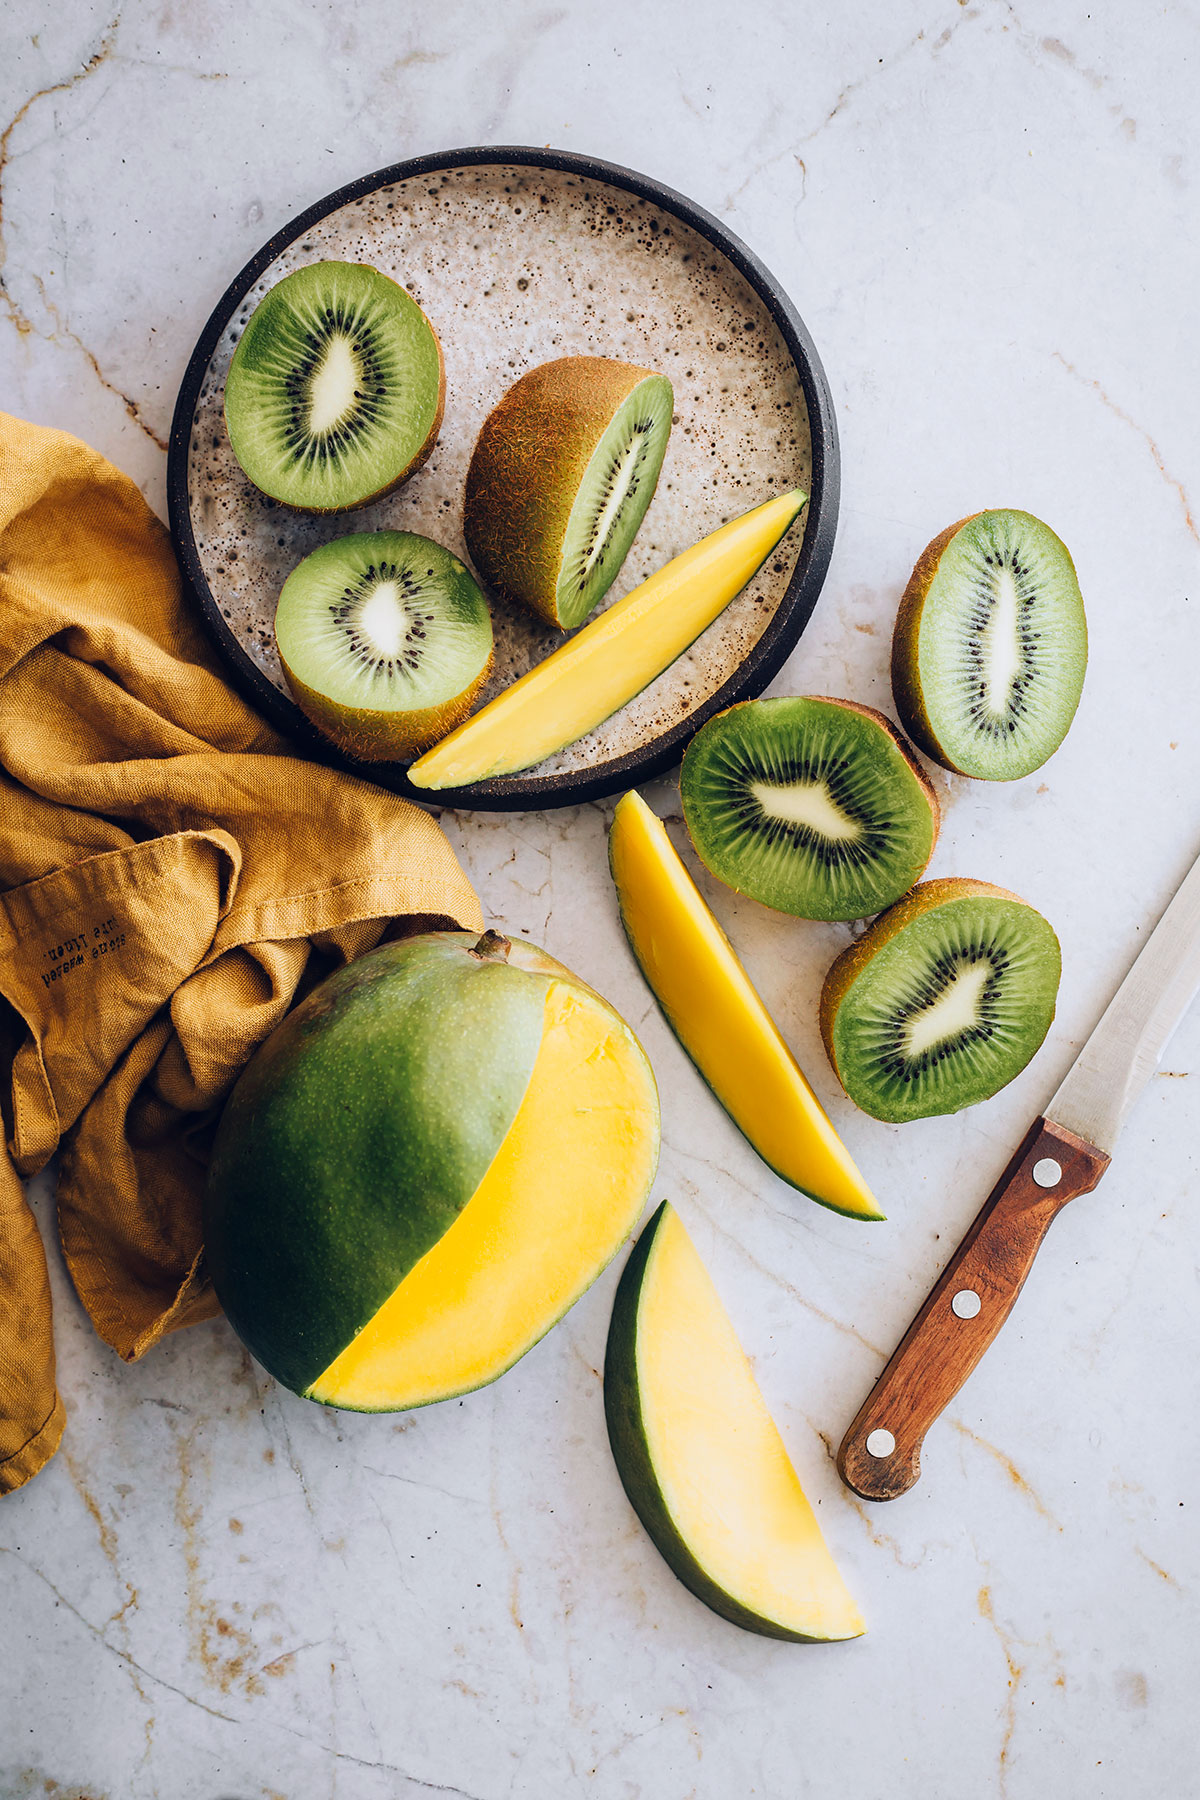 Mango Kiwi Ingredients